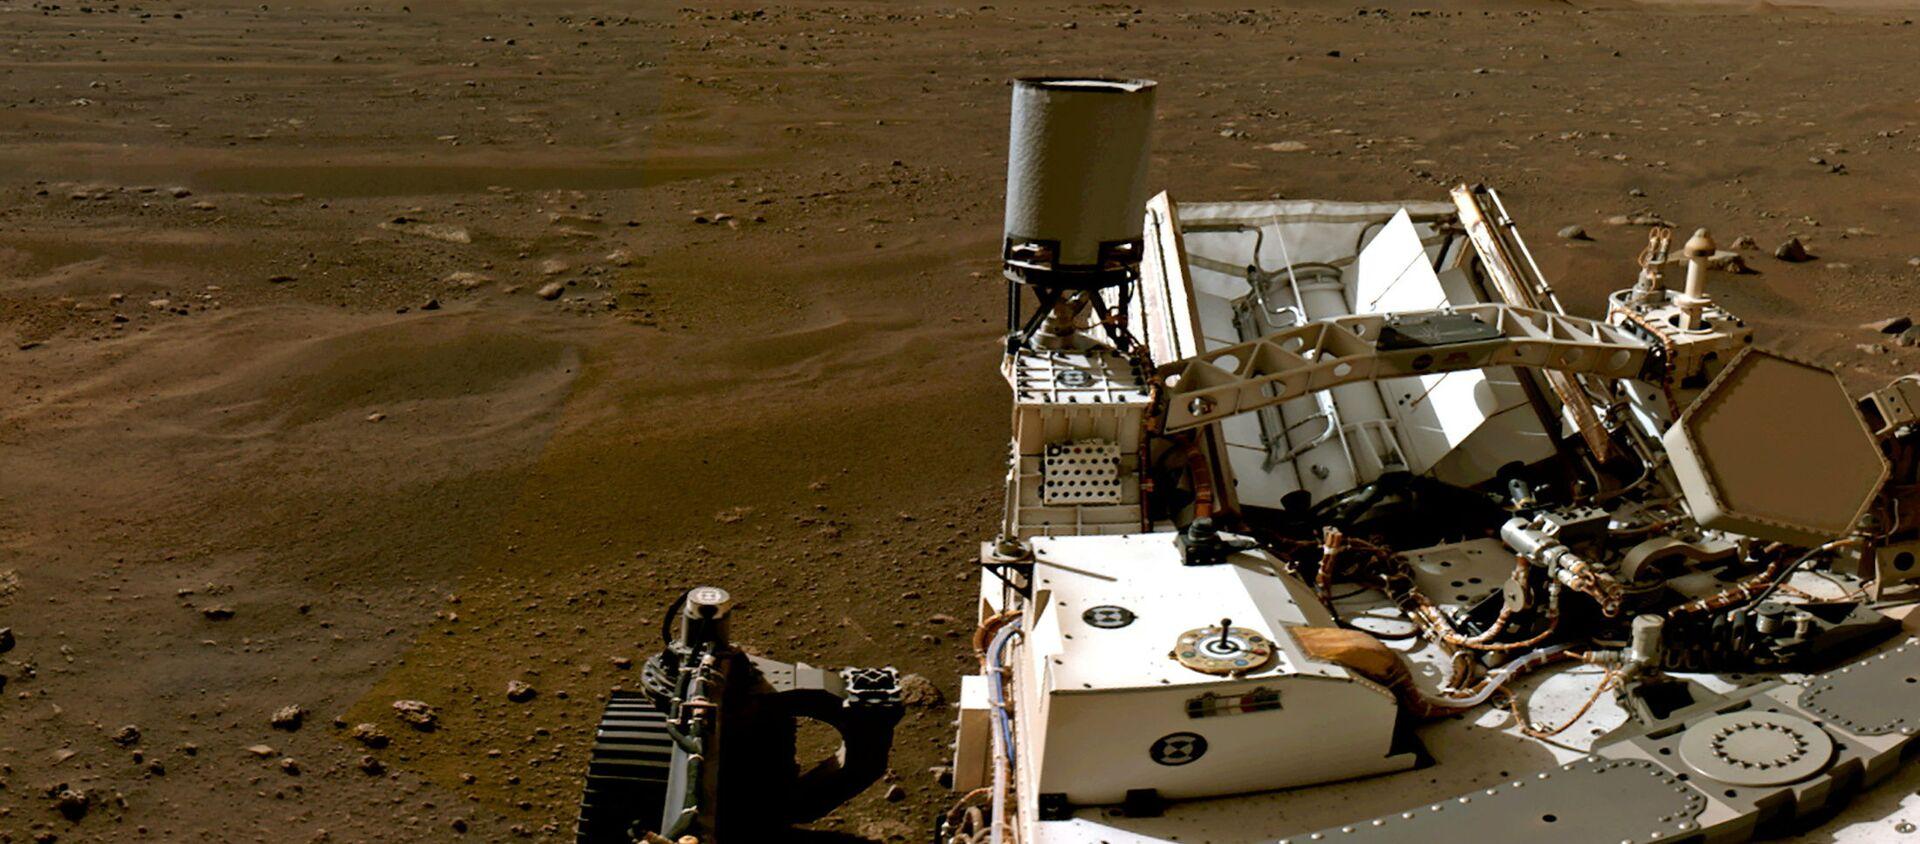 Марсианский пейзаж, снятый марсоходом Perseverance - Sputnik Таджикистан, 1920, 24.02.2021